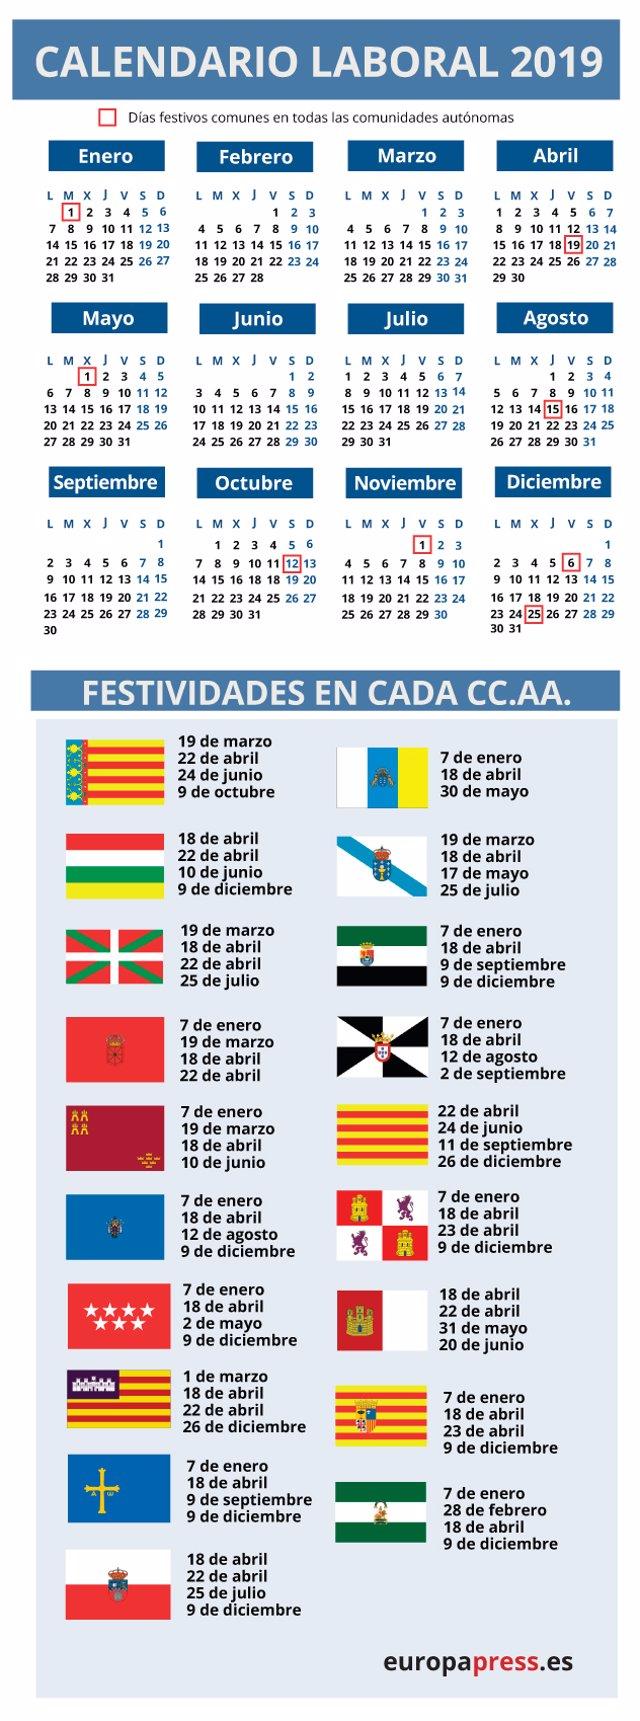 Calendario Festivo.Calendario Laboral De 2019 Los Festivos Por Comunidades